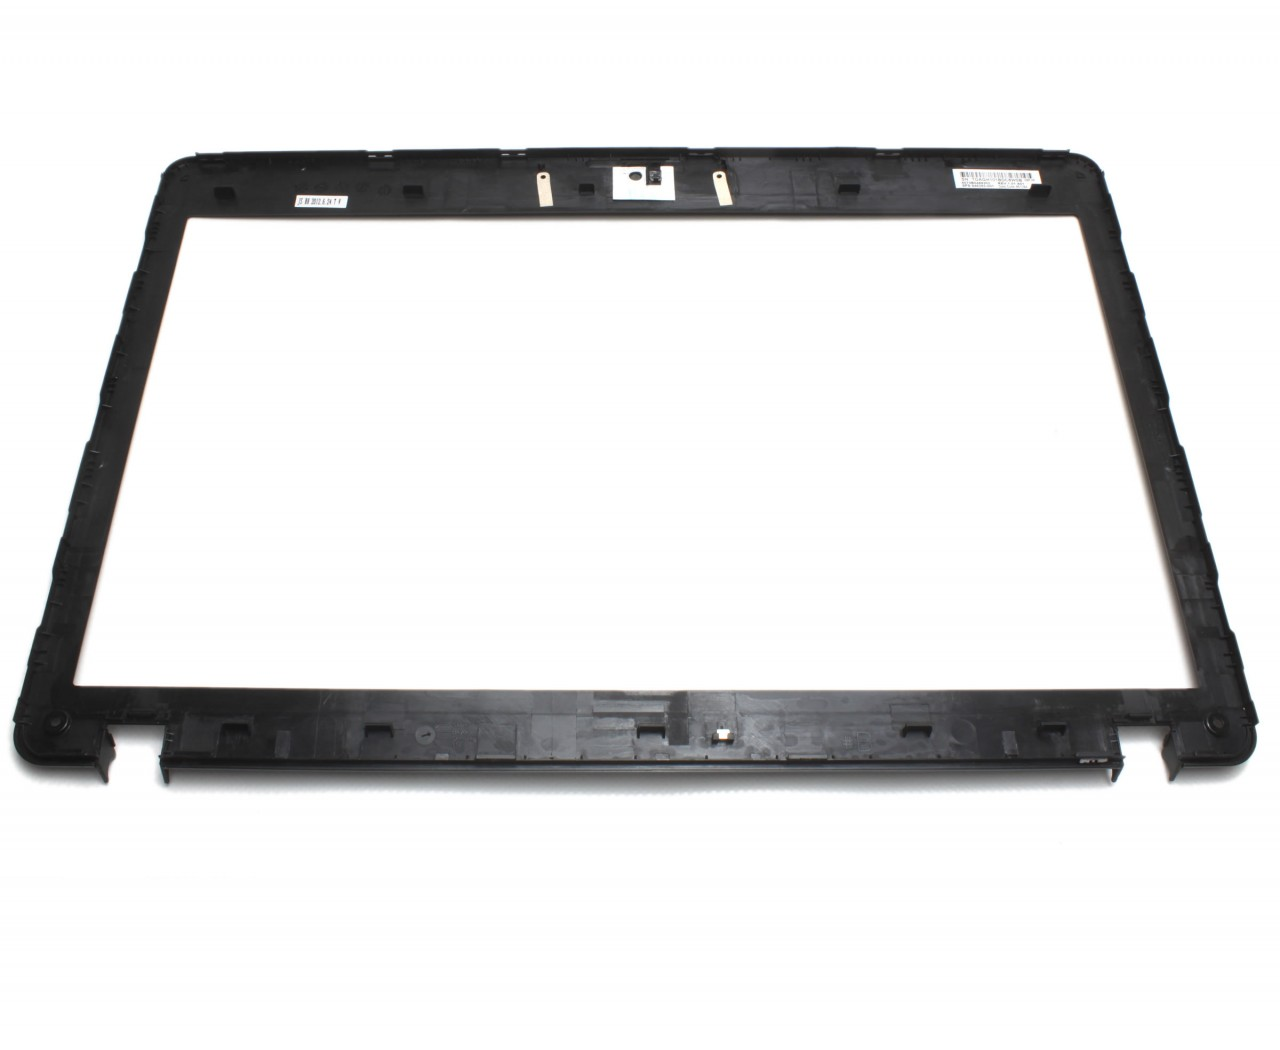 Rama Display HP 646265 001 Bezel Front Cover Neagra imagine powerlaptop.ro 2021